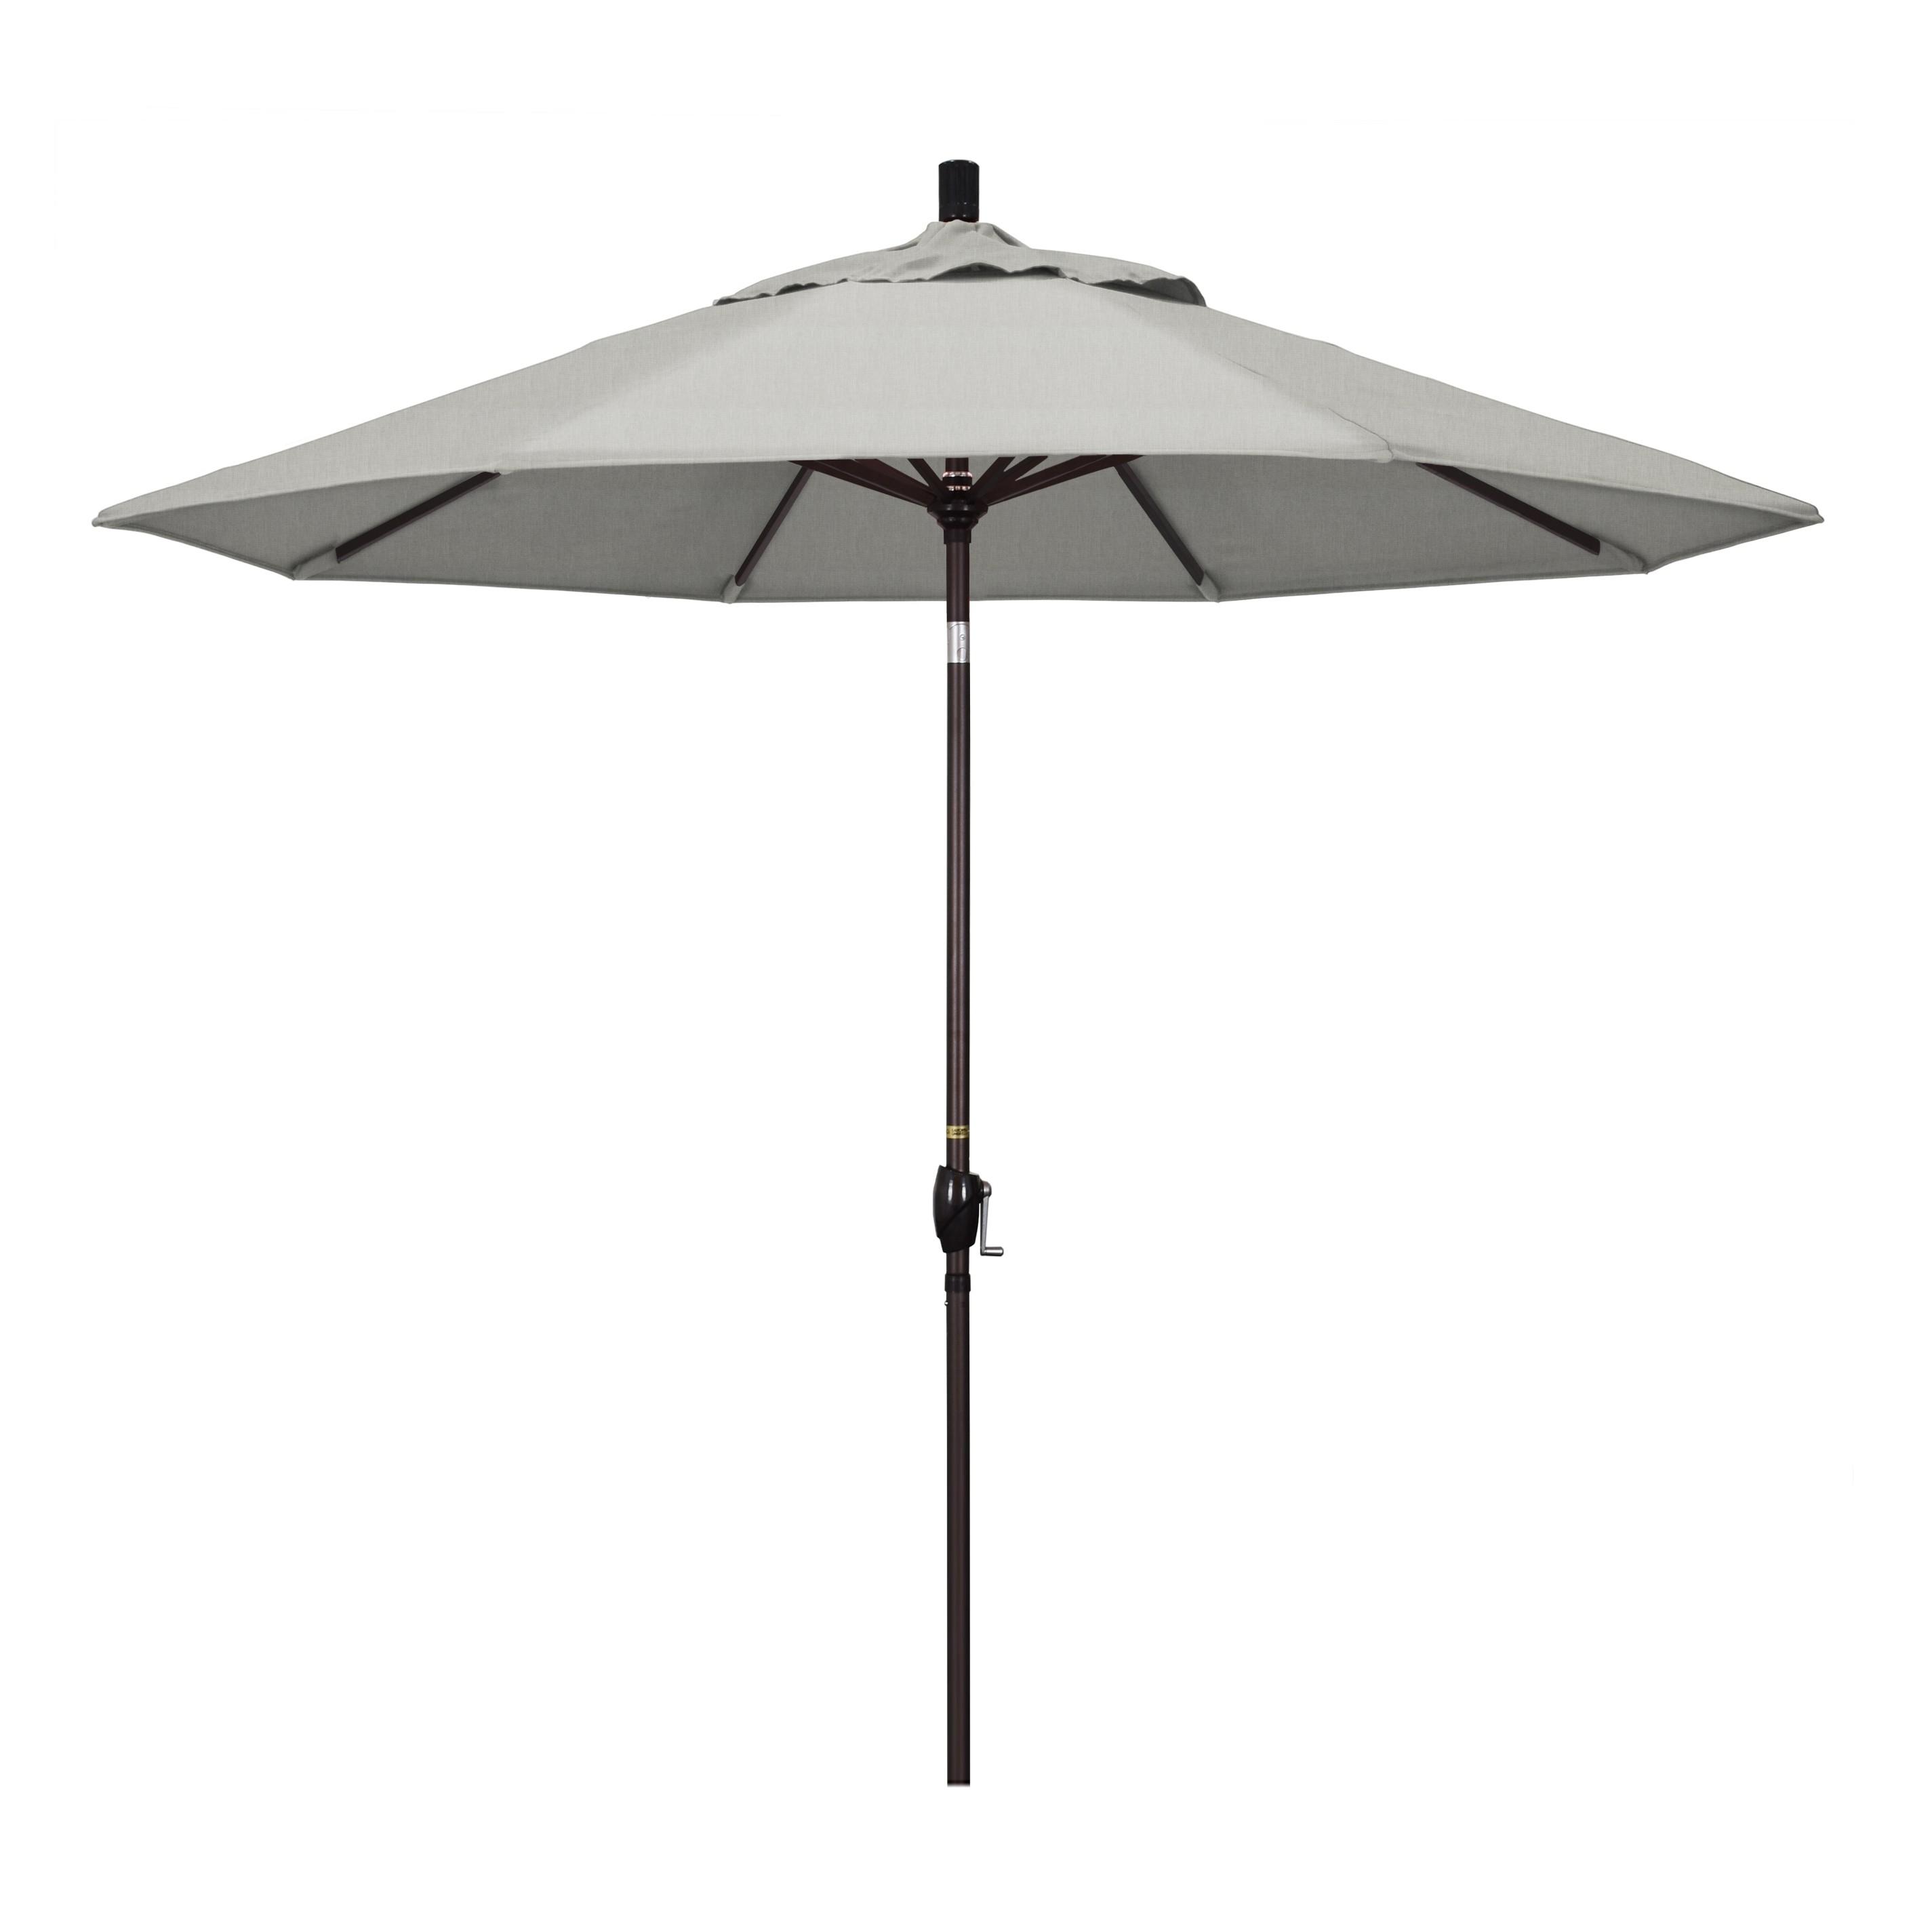 9' Market Style Outdoor Umbrella with Wind Vent Canvas Granite